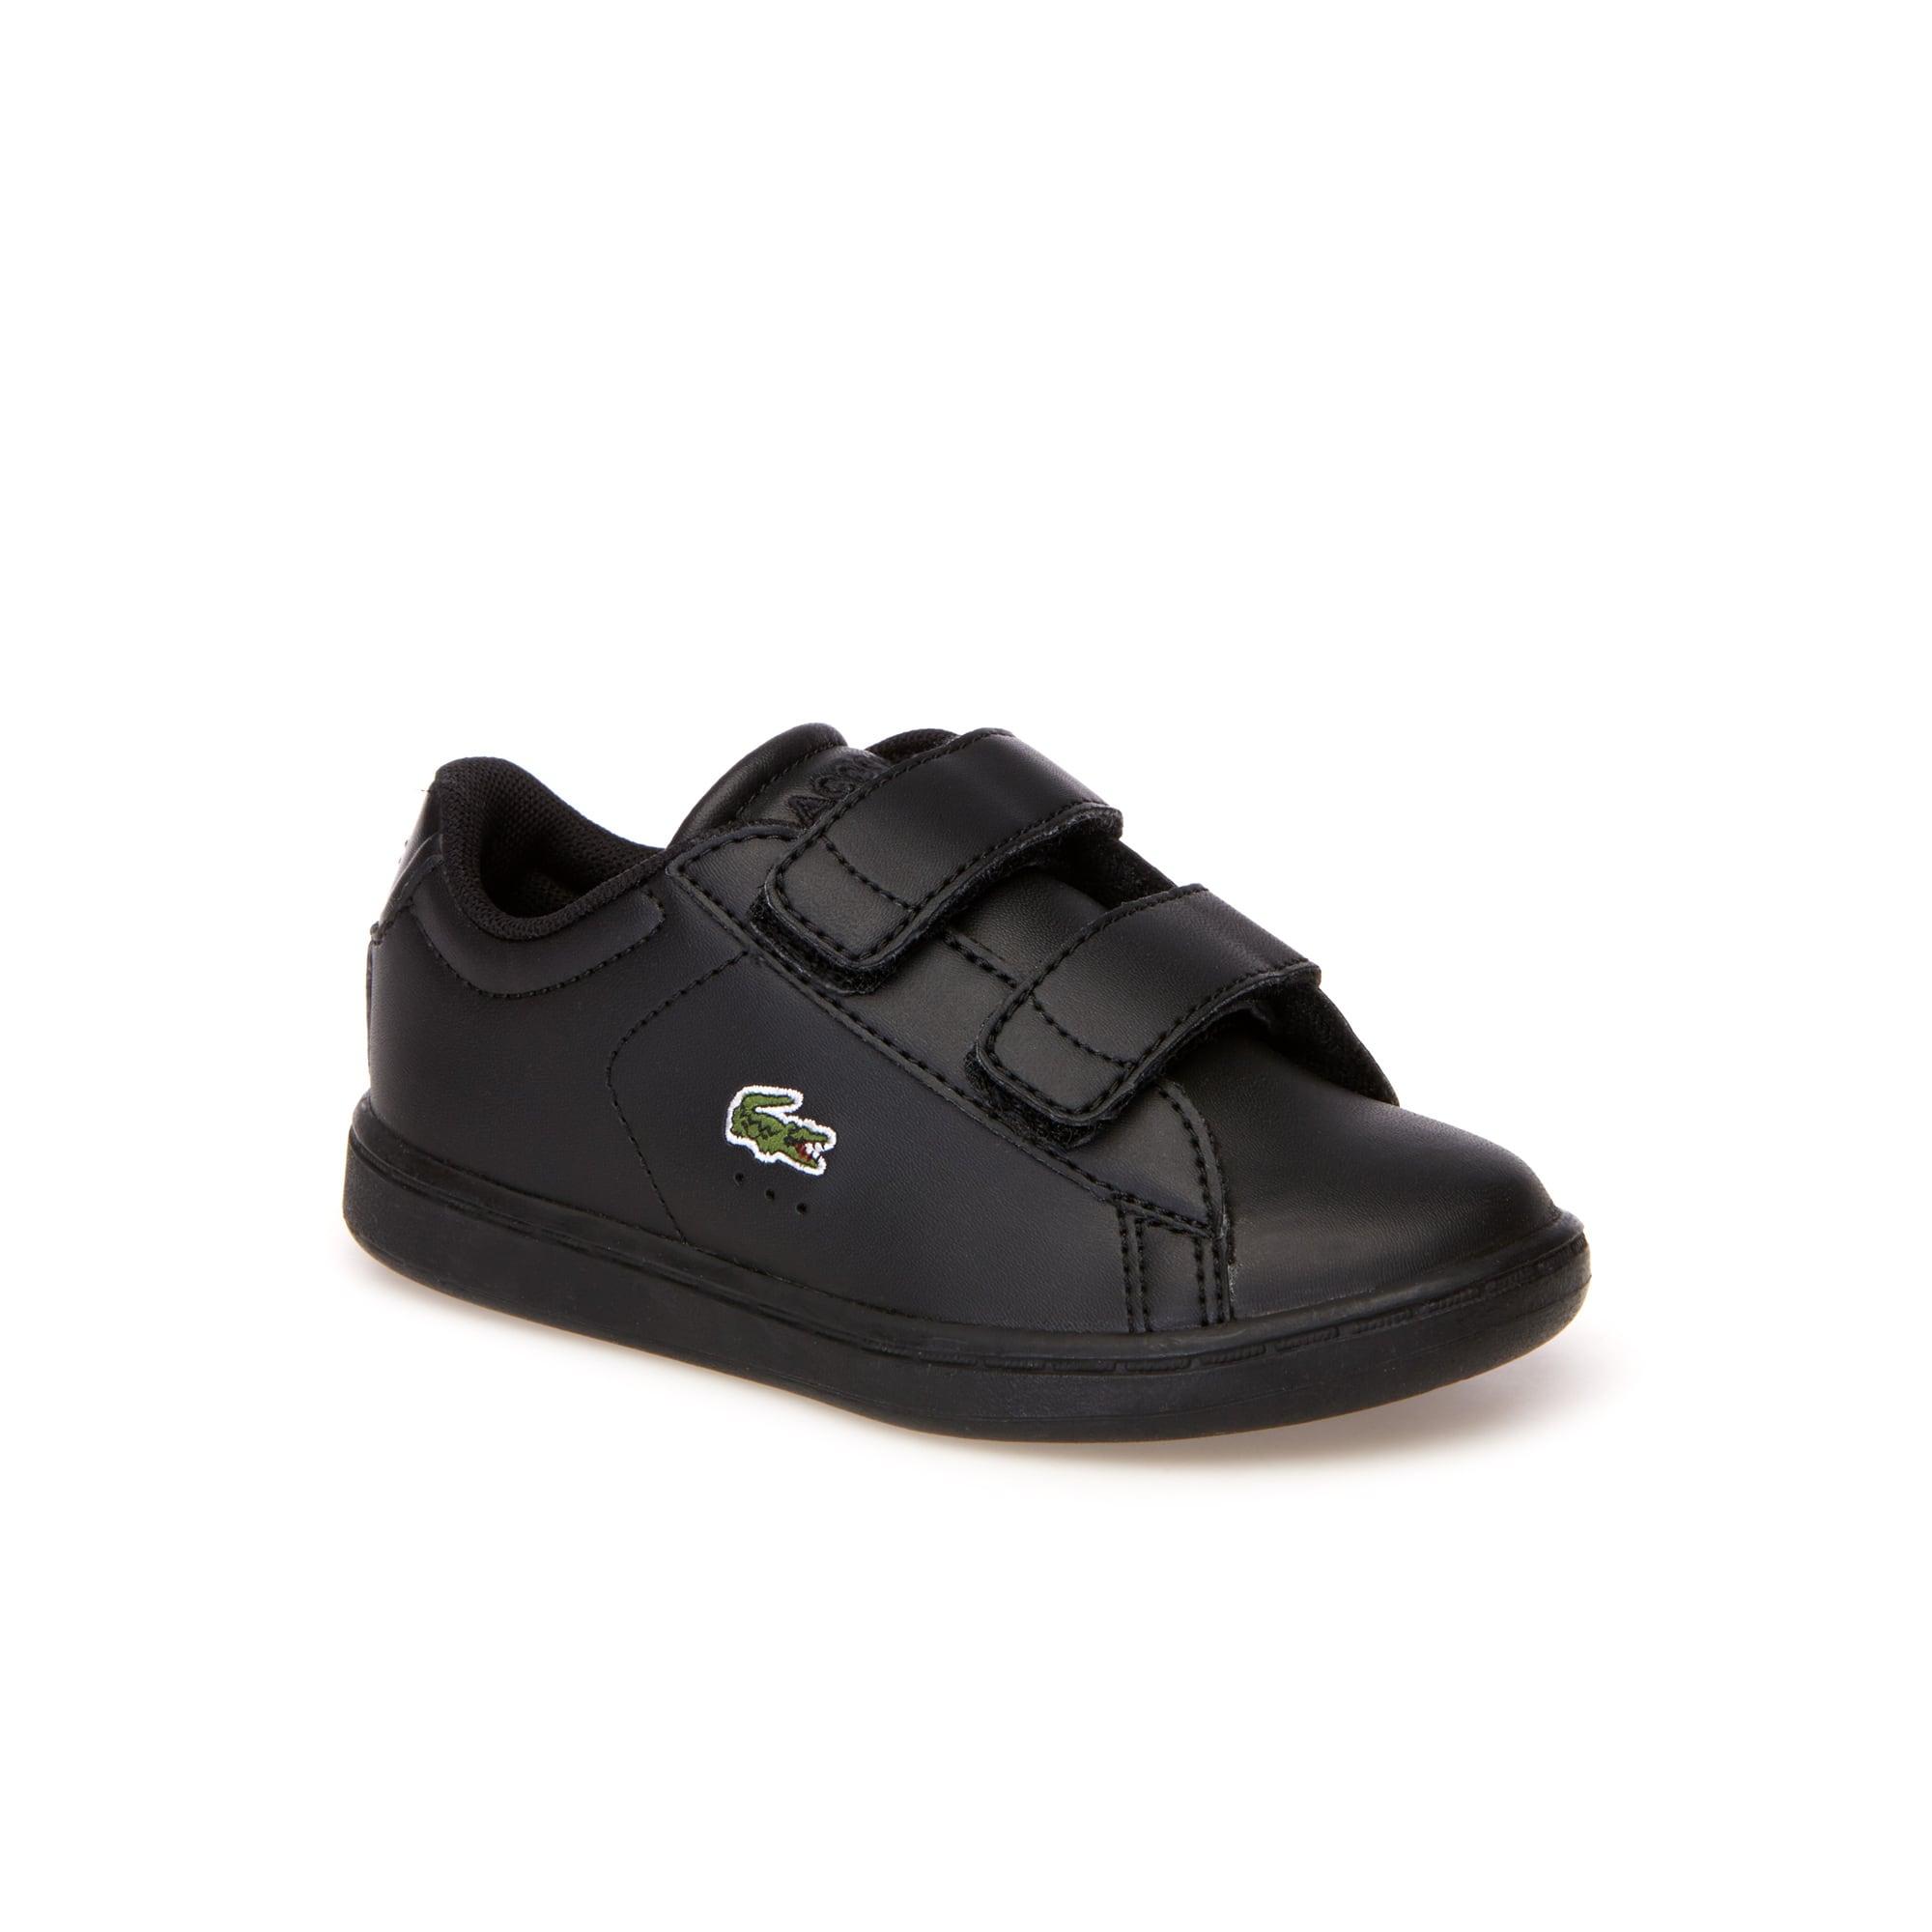 Sneakers Carnaby Evo kids' in similpelle